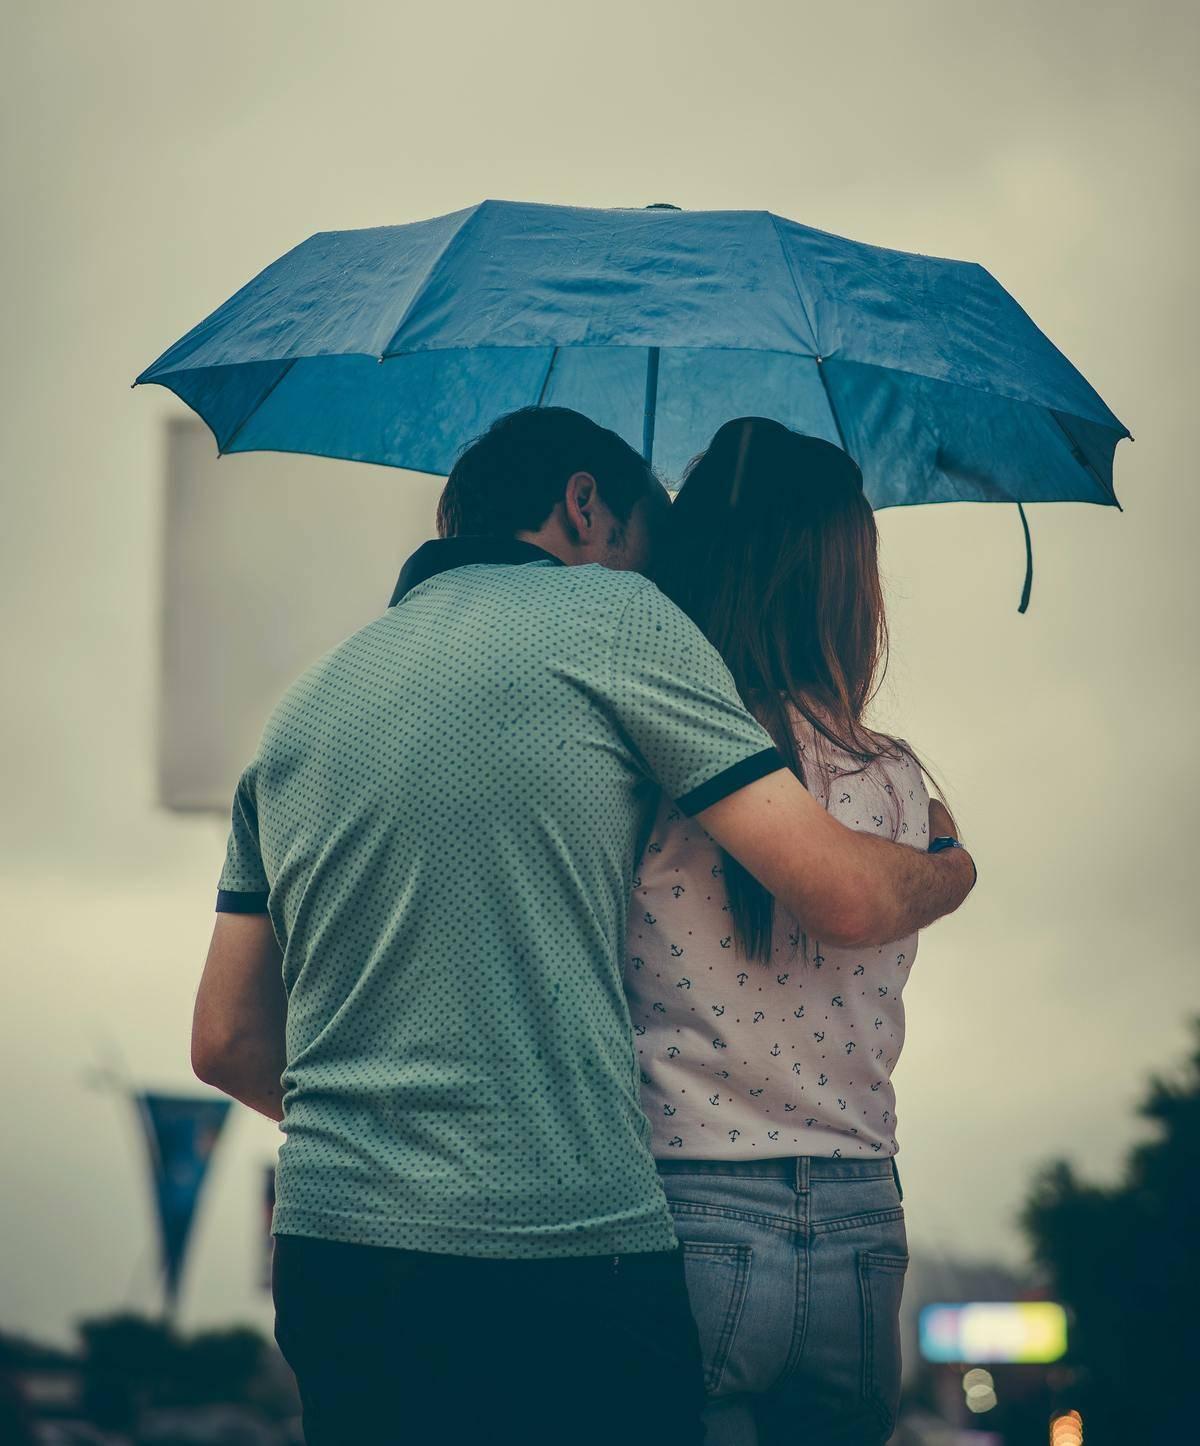 Man under umbrella with woman